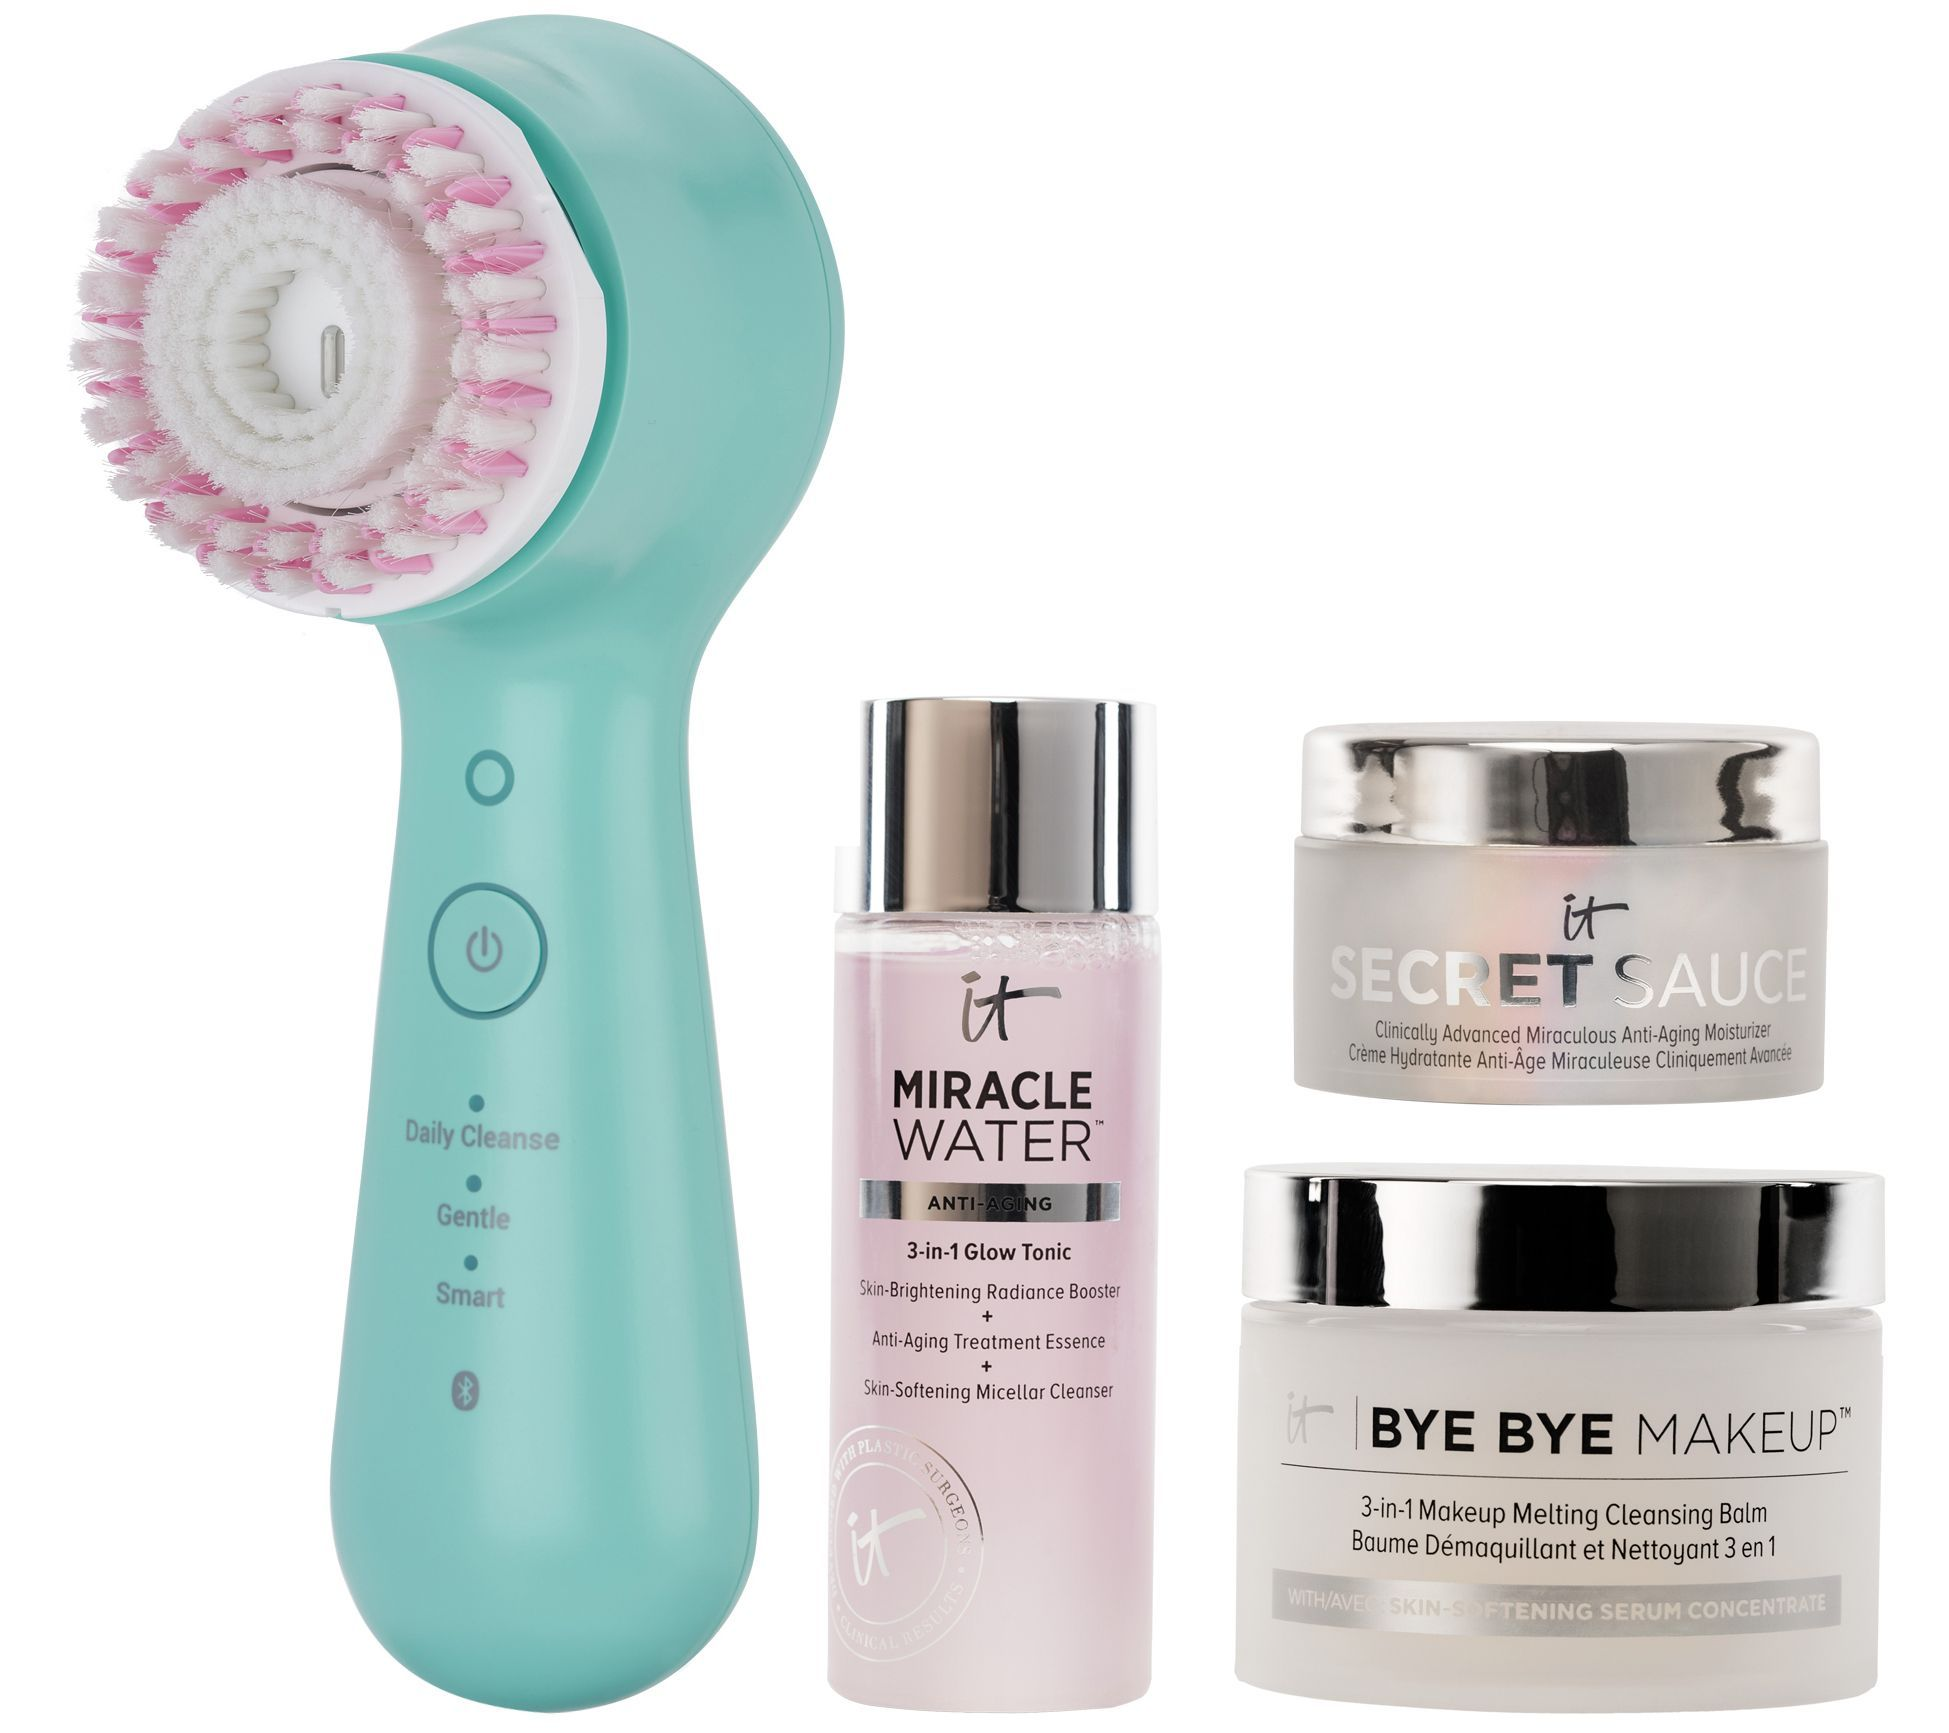 Clarisonic Mia Smart Cleansing System & IT Cosmetics Set